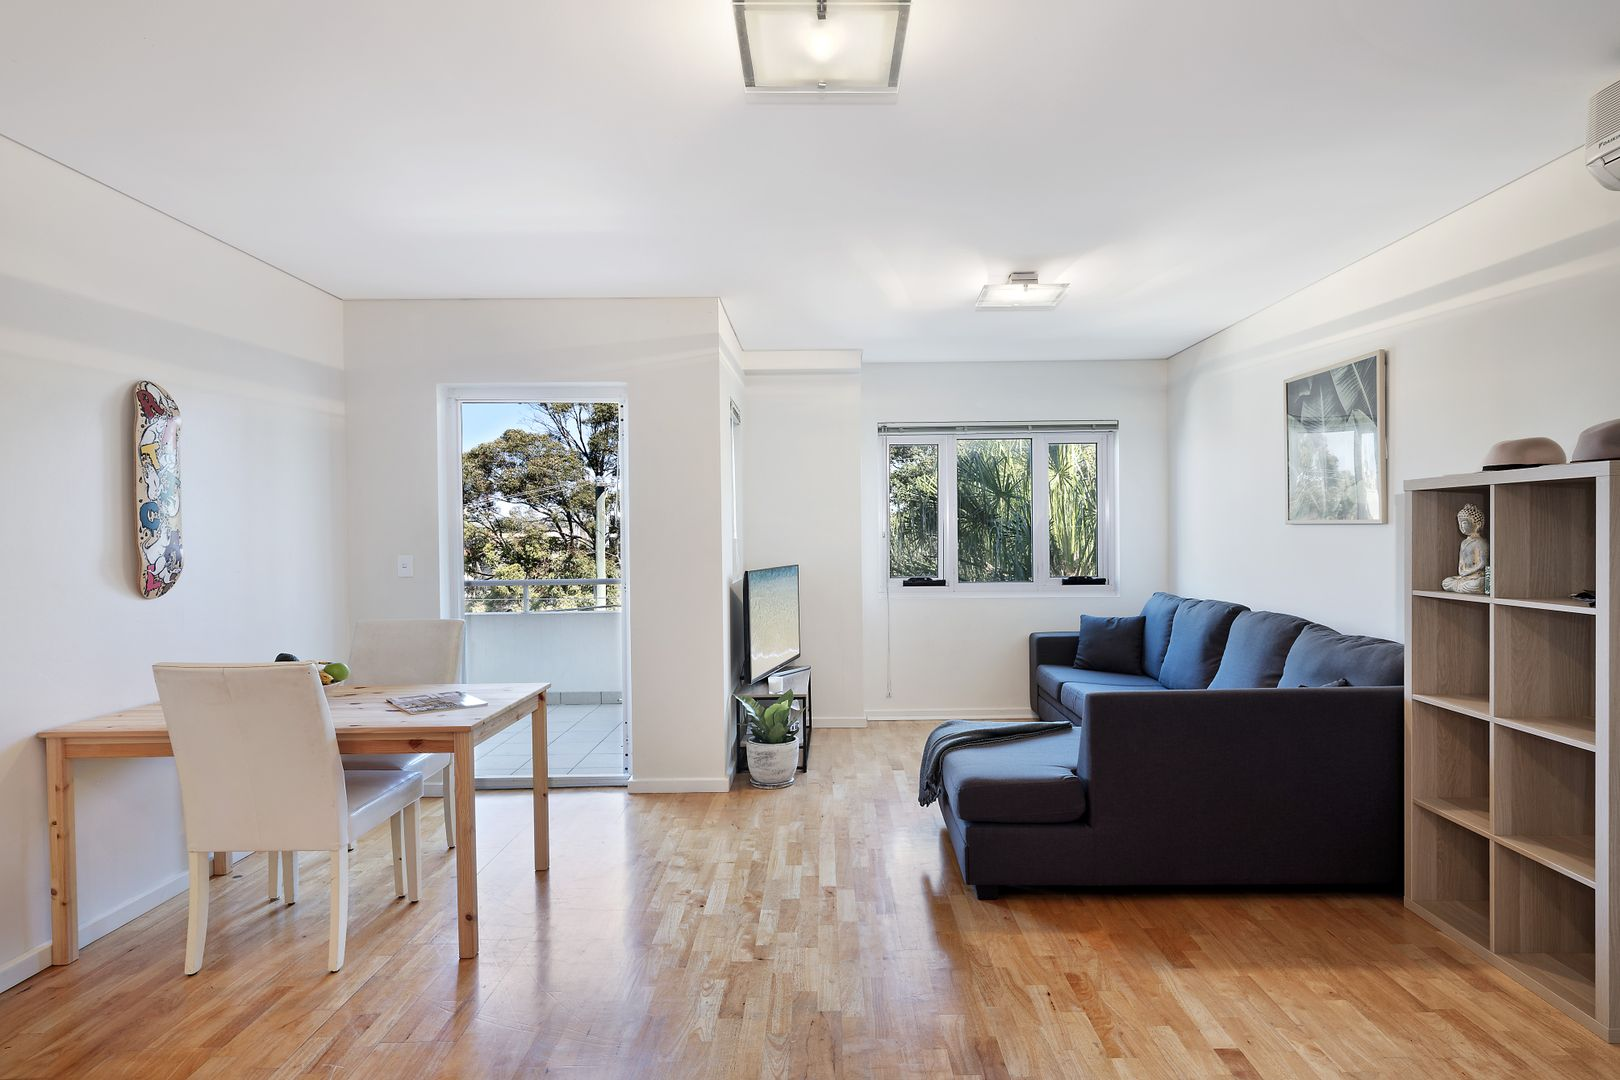 17/19-23 Waine Street, Freshwater NSW 2096, Image 0